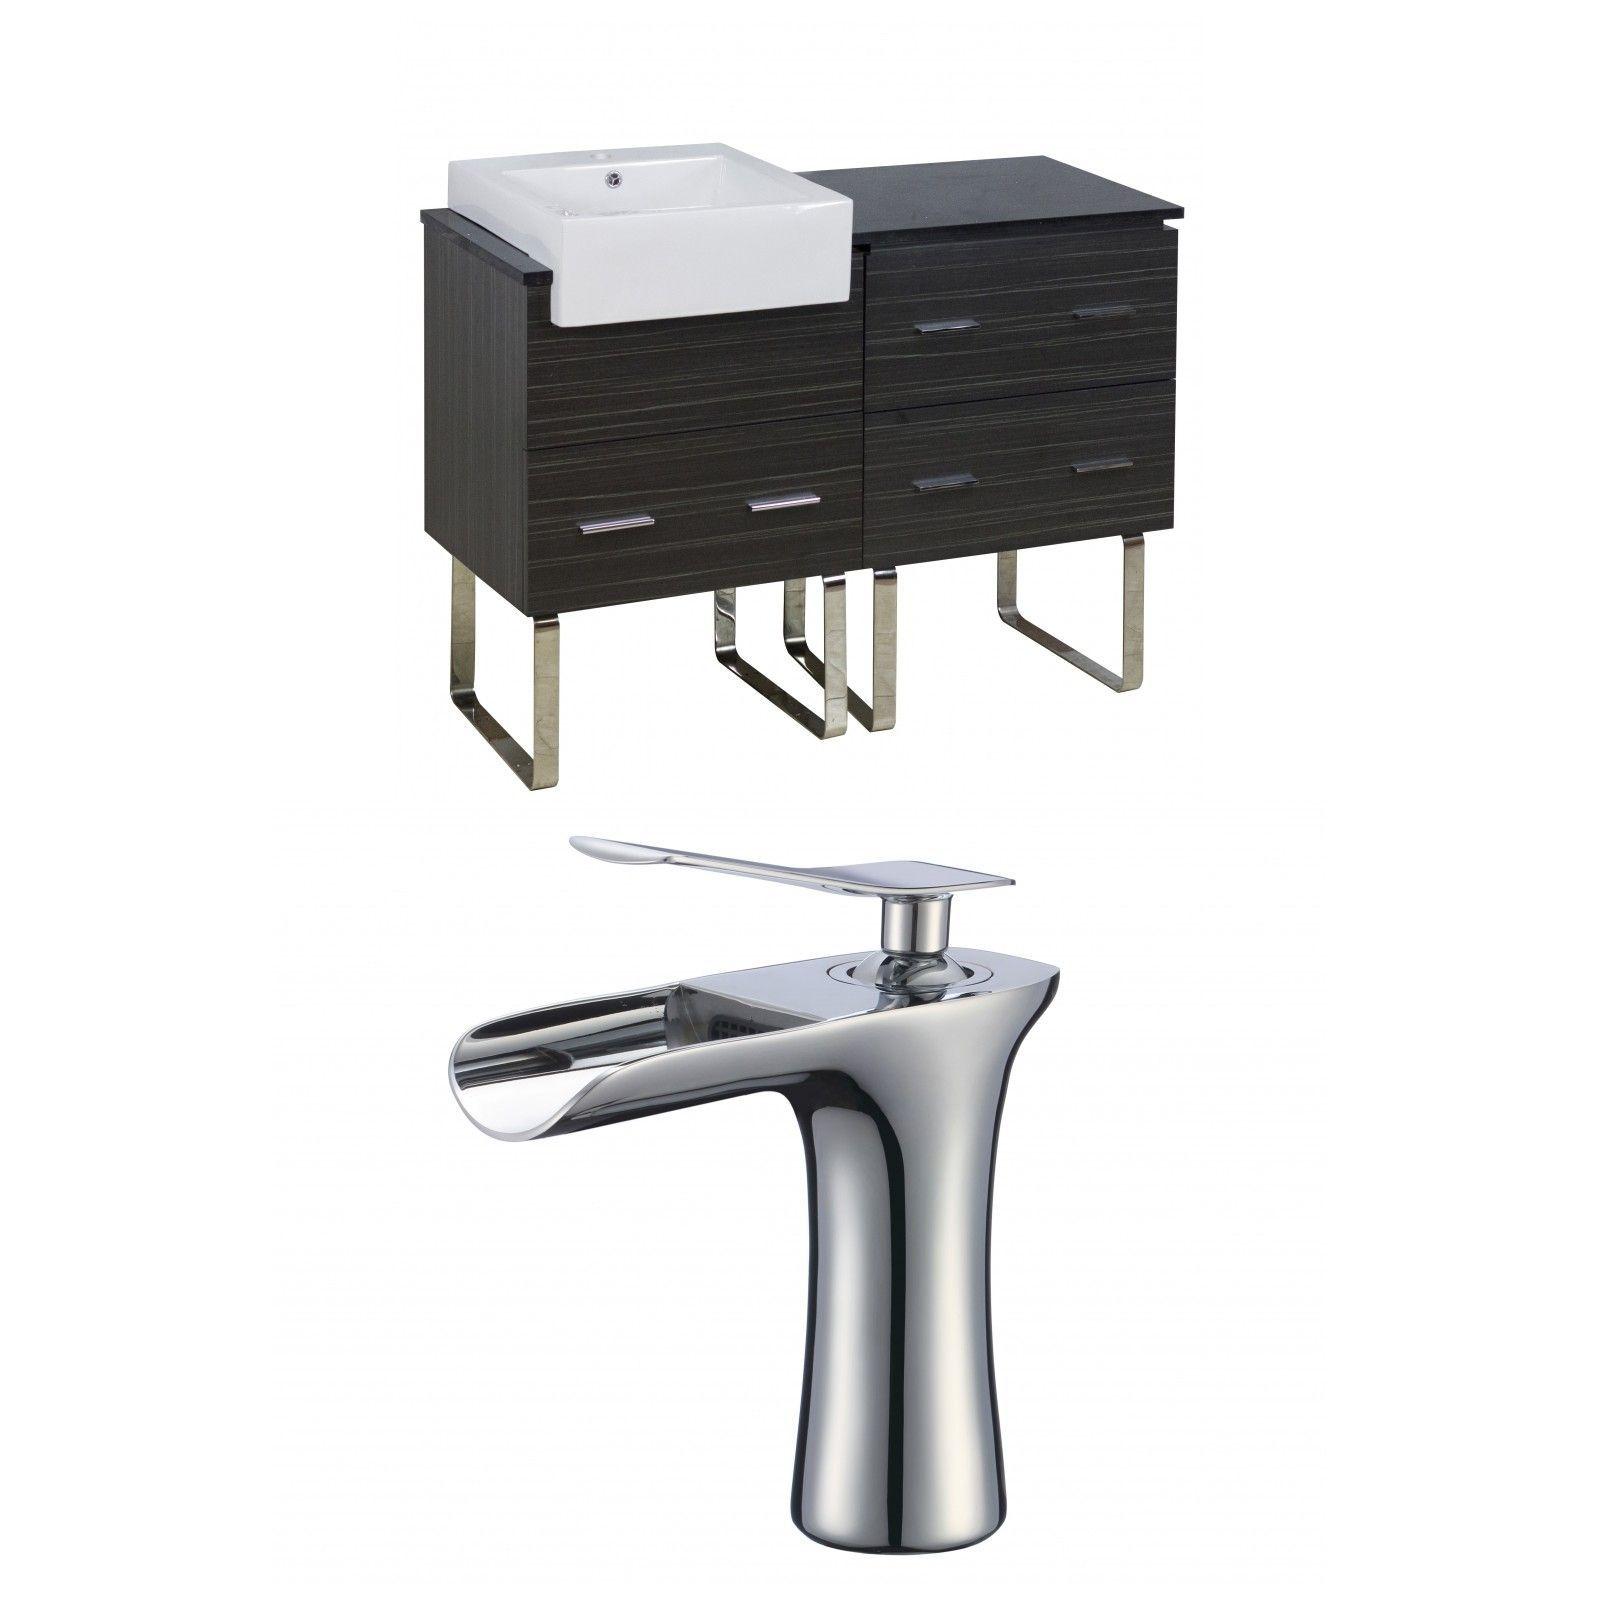 "Xena Farmhouse 48"" Single Plywood-Melamine Bathroom Vanity Set"